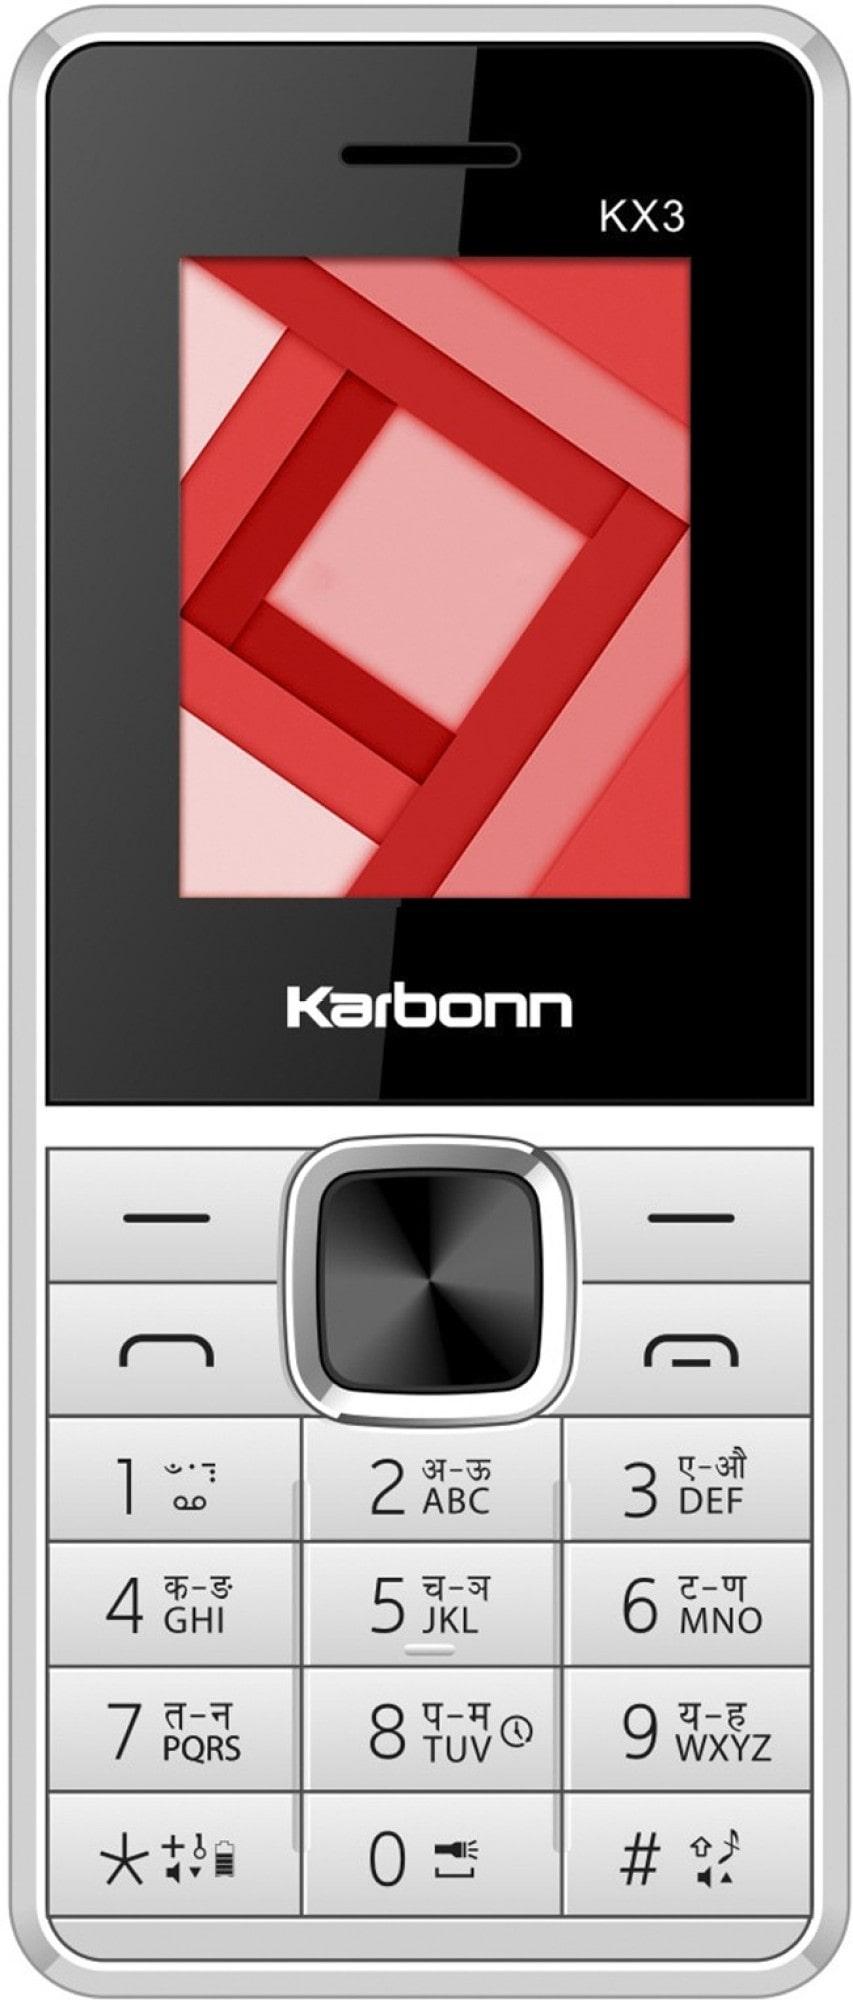 https://assetscdn1.paytm.com/images/catalog/product/M/MO/MOBKARBONN-KX3-INDI867325CA85BD36/0..jpg